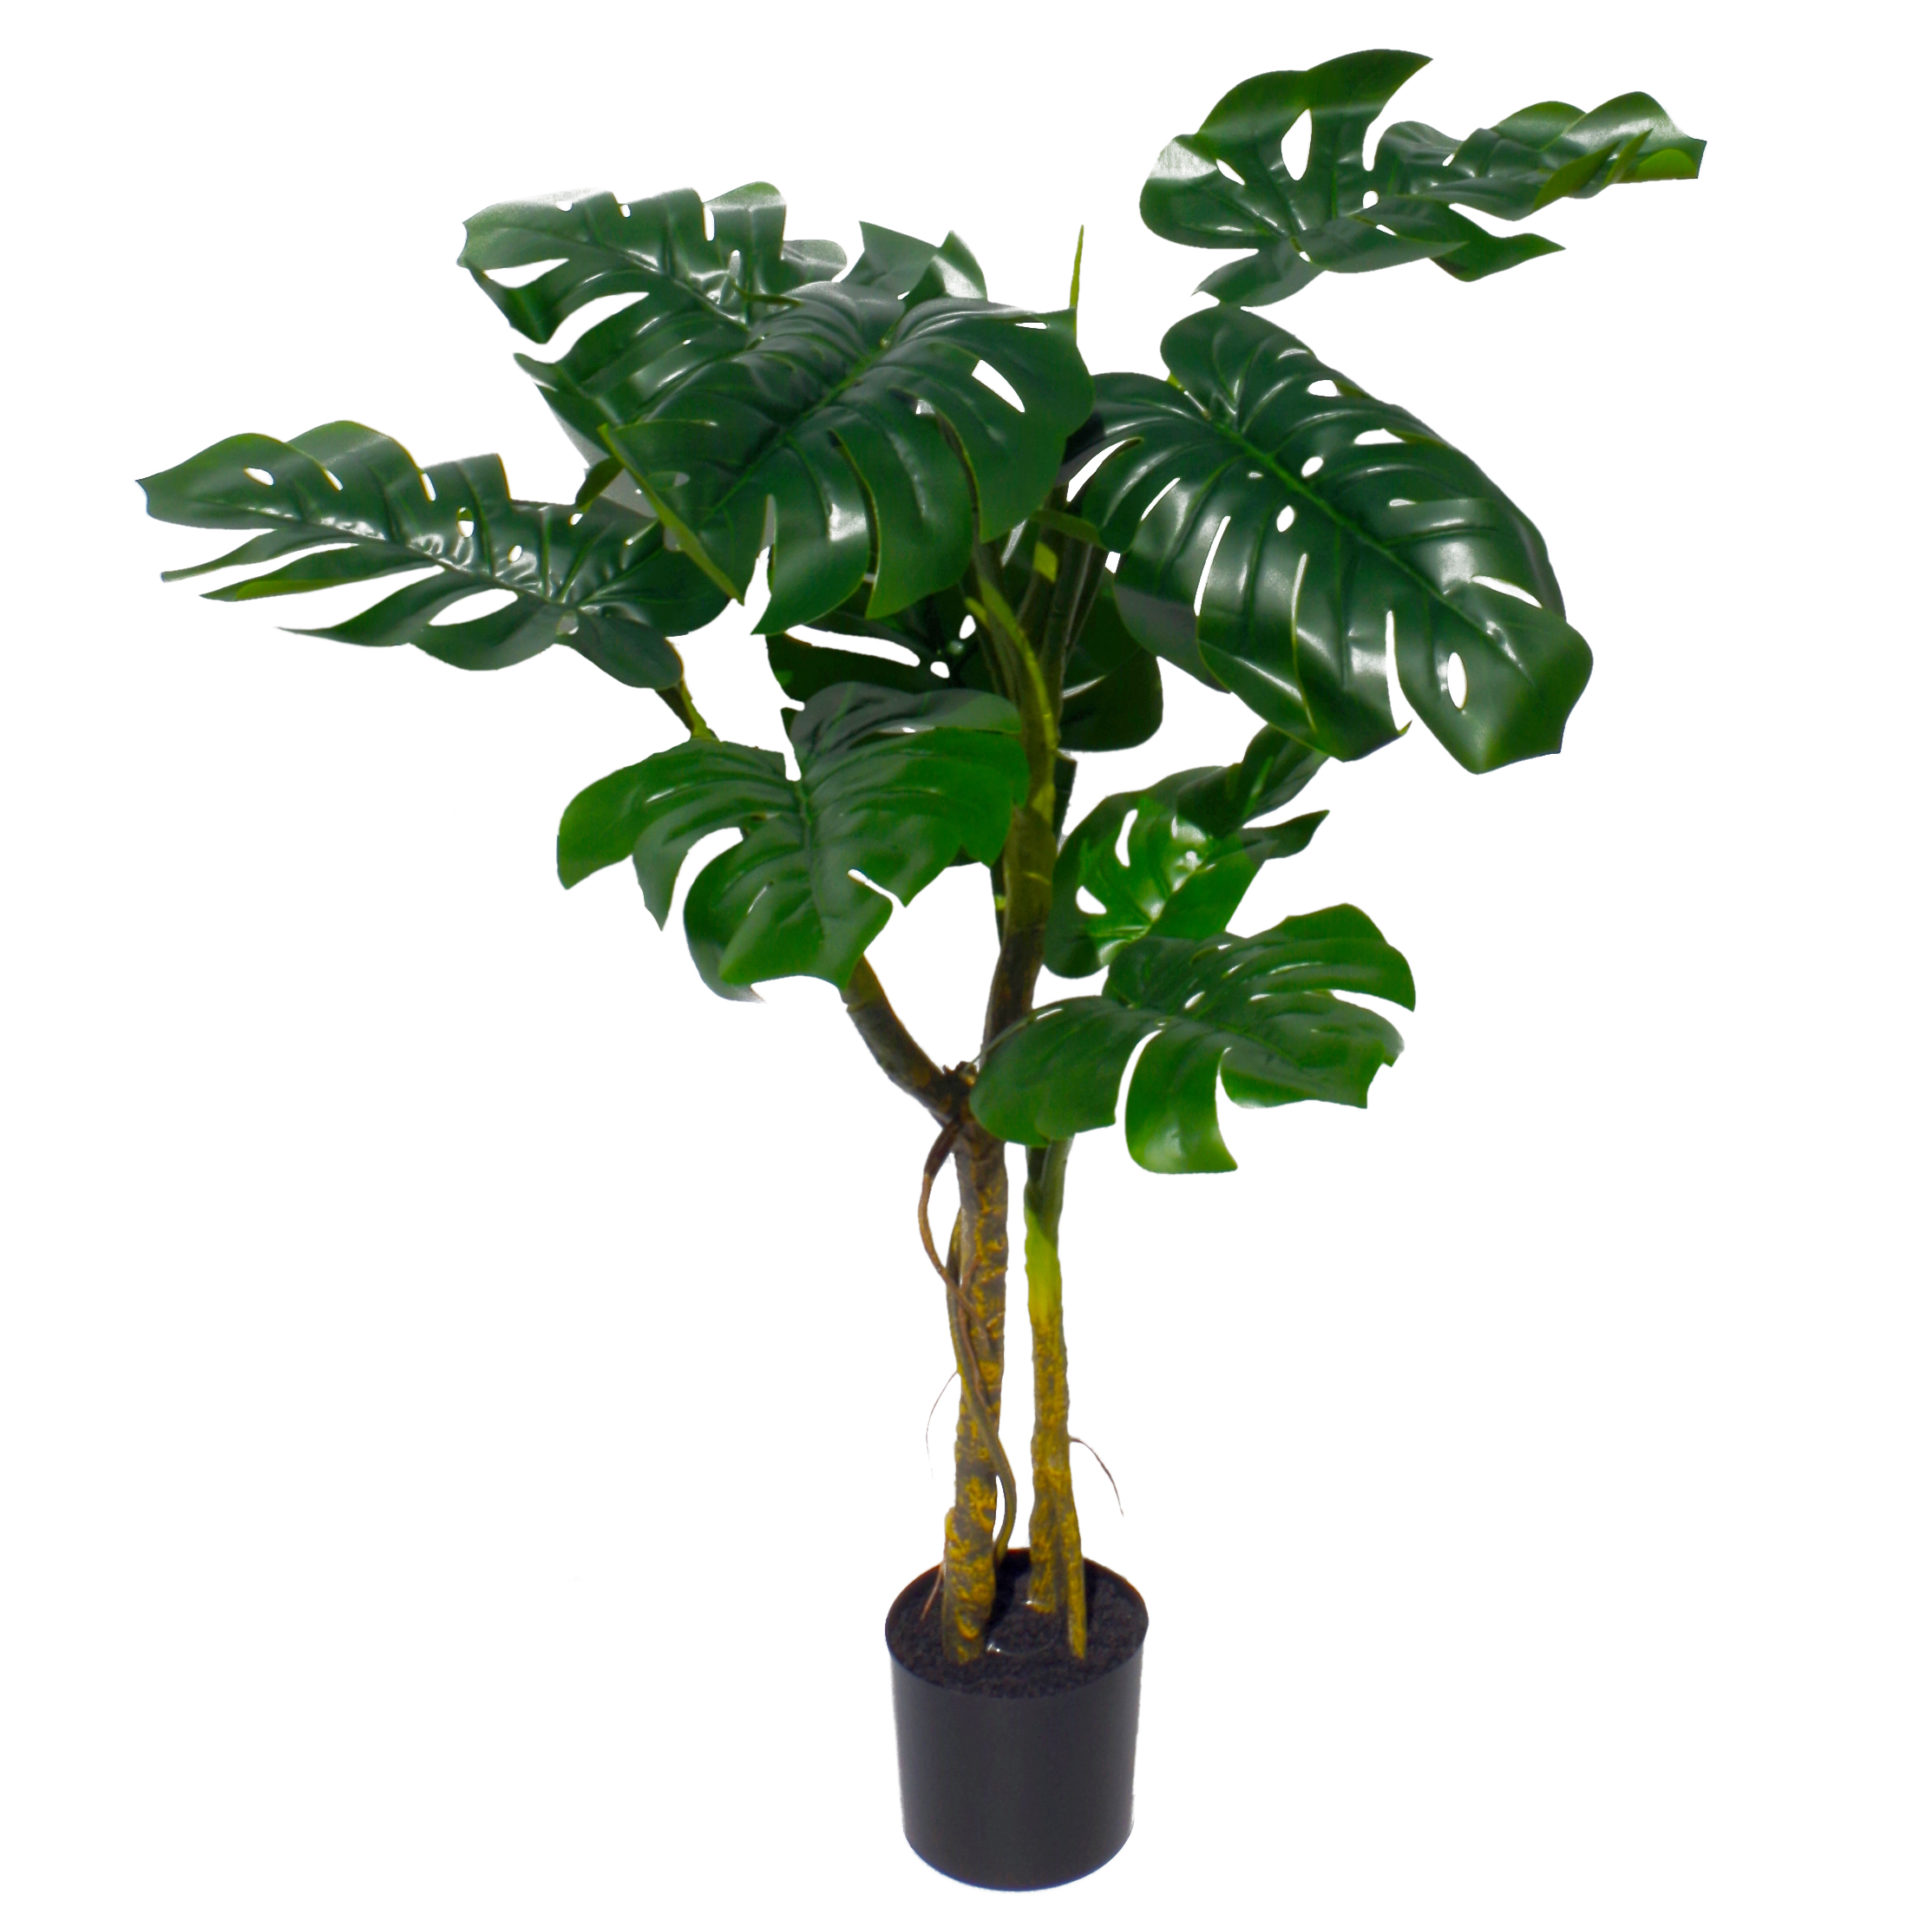 120cm Artificial Twisted Stem Monstera Plant Leaf Artificial Plants